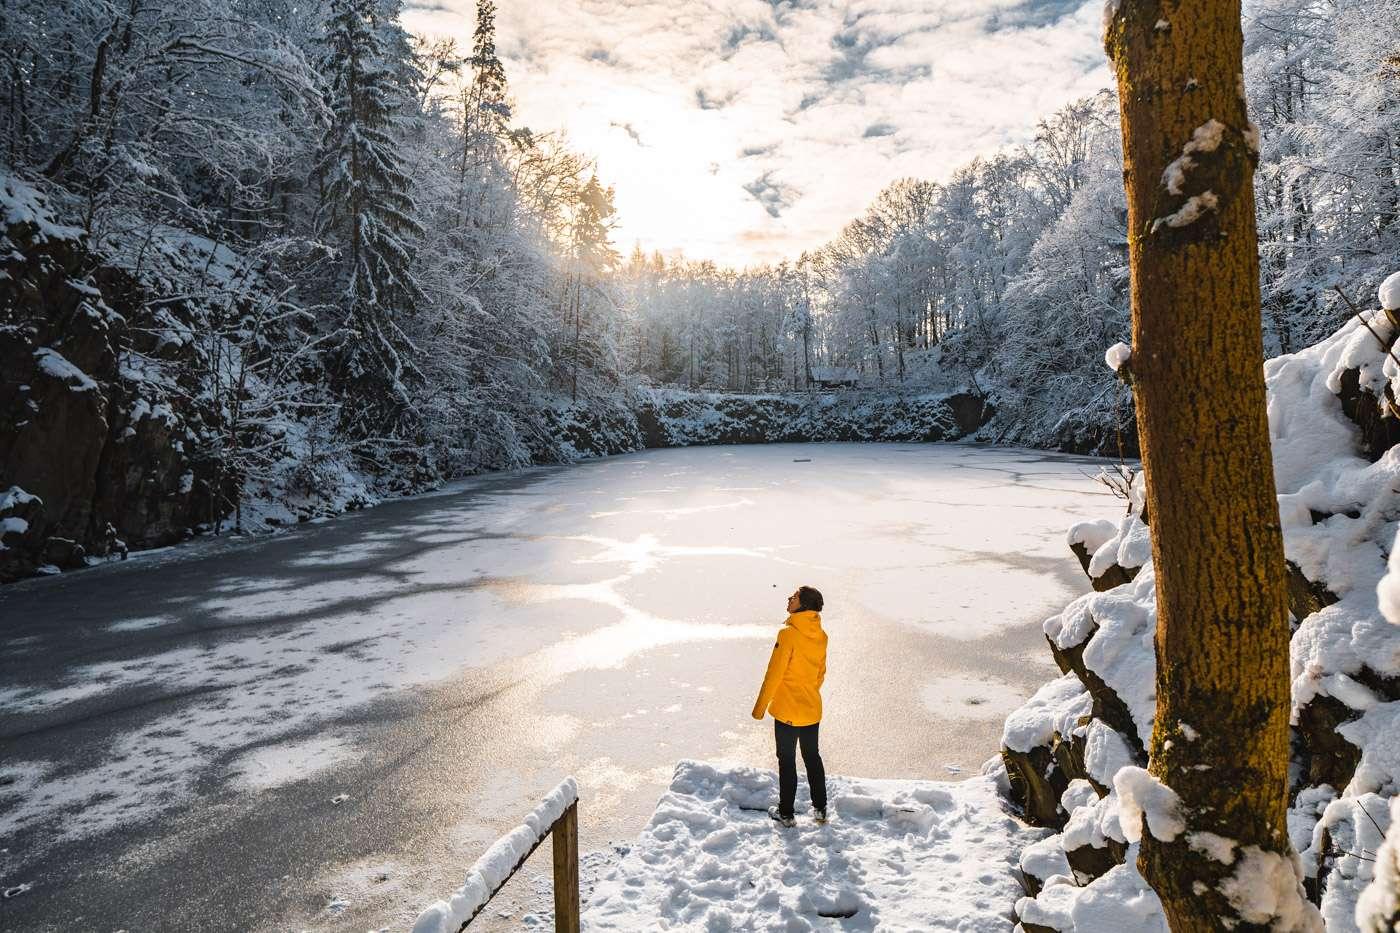 fotografieren im winter 033